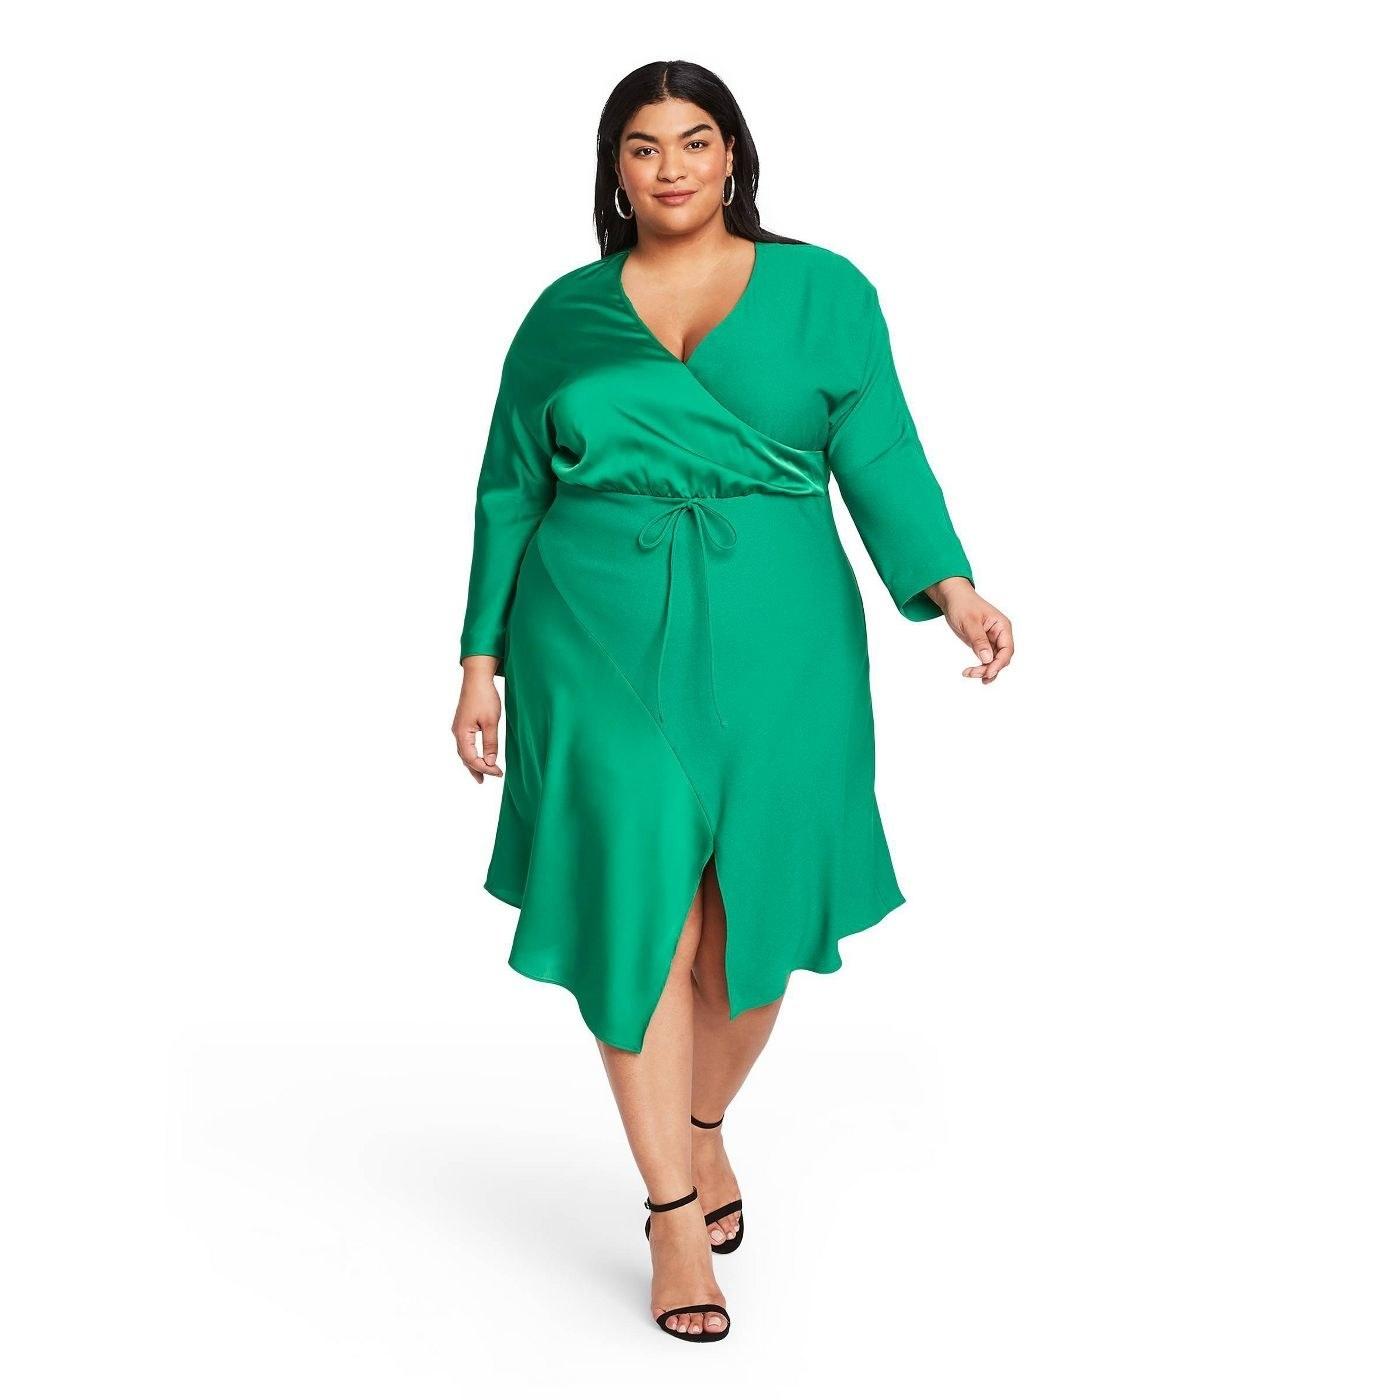 model wearing emerald green midi V-neck wrap dress